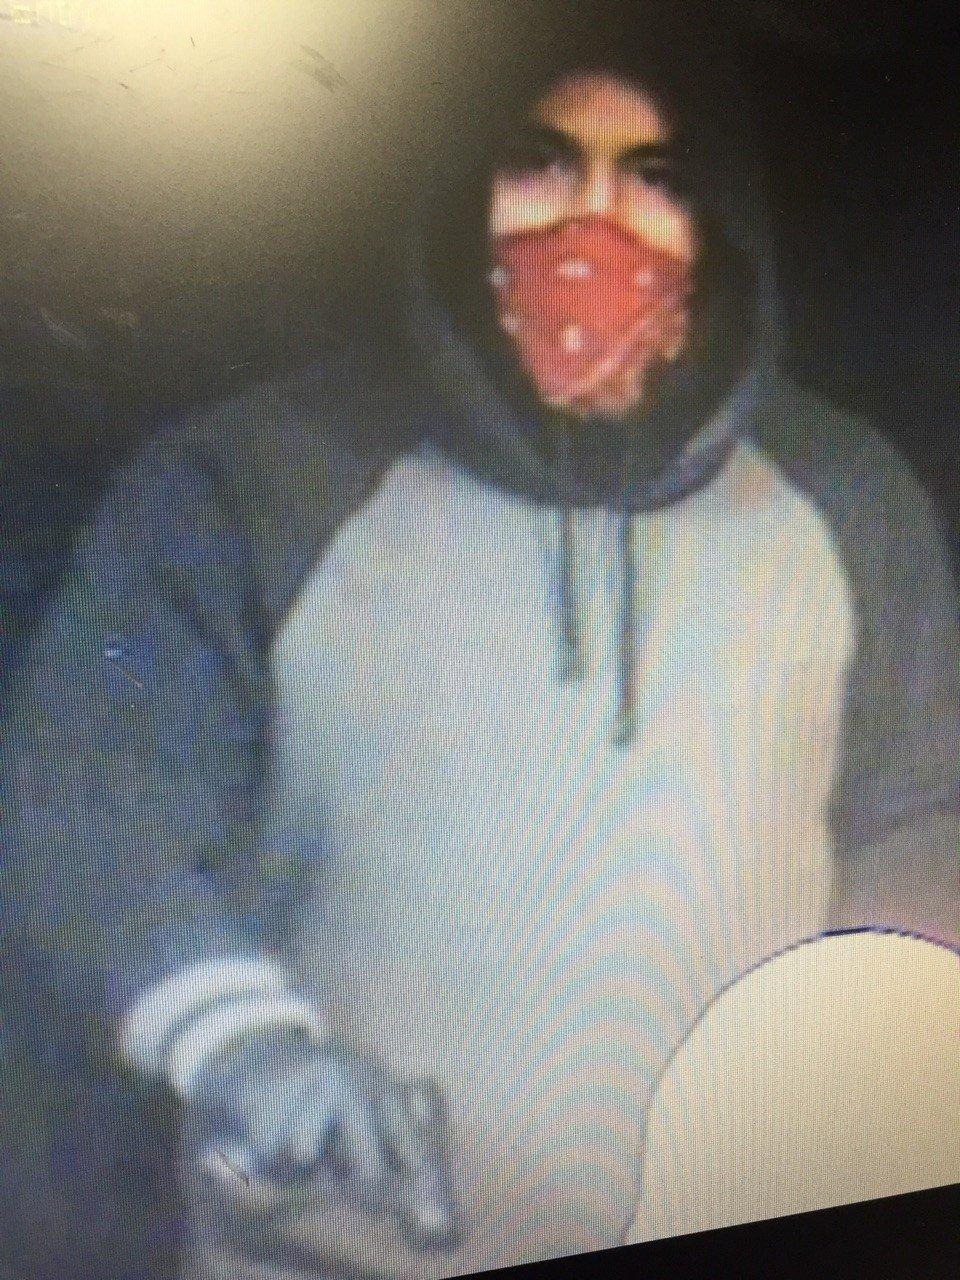 Robbery suspect (Courtesy: Oregon City Police)